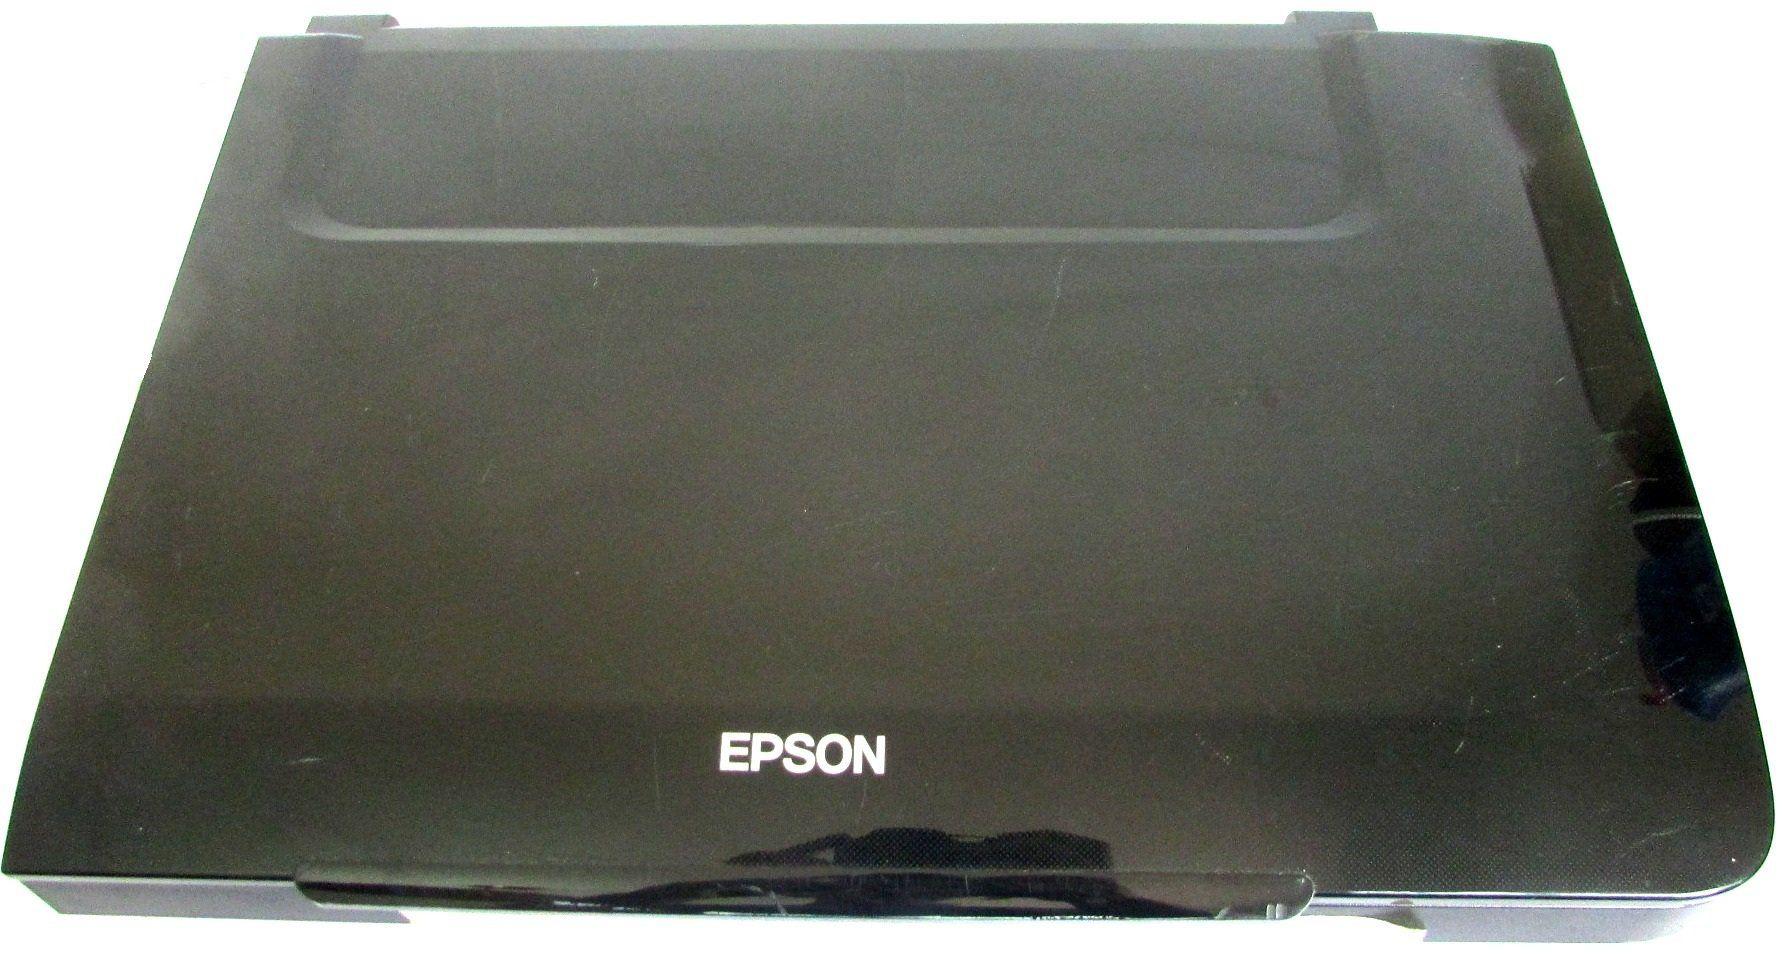 Scanner Epson Tx115 (semi novo)